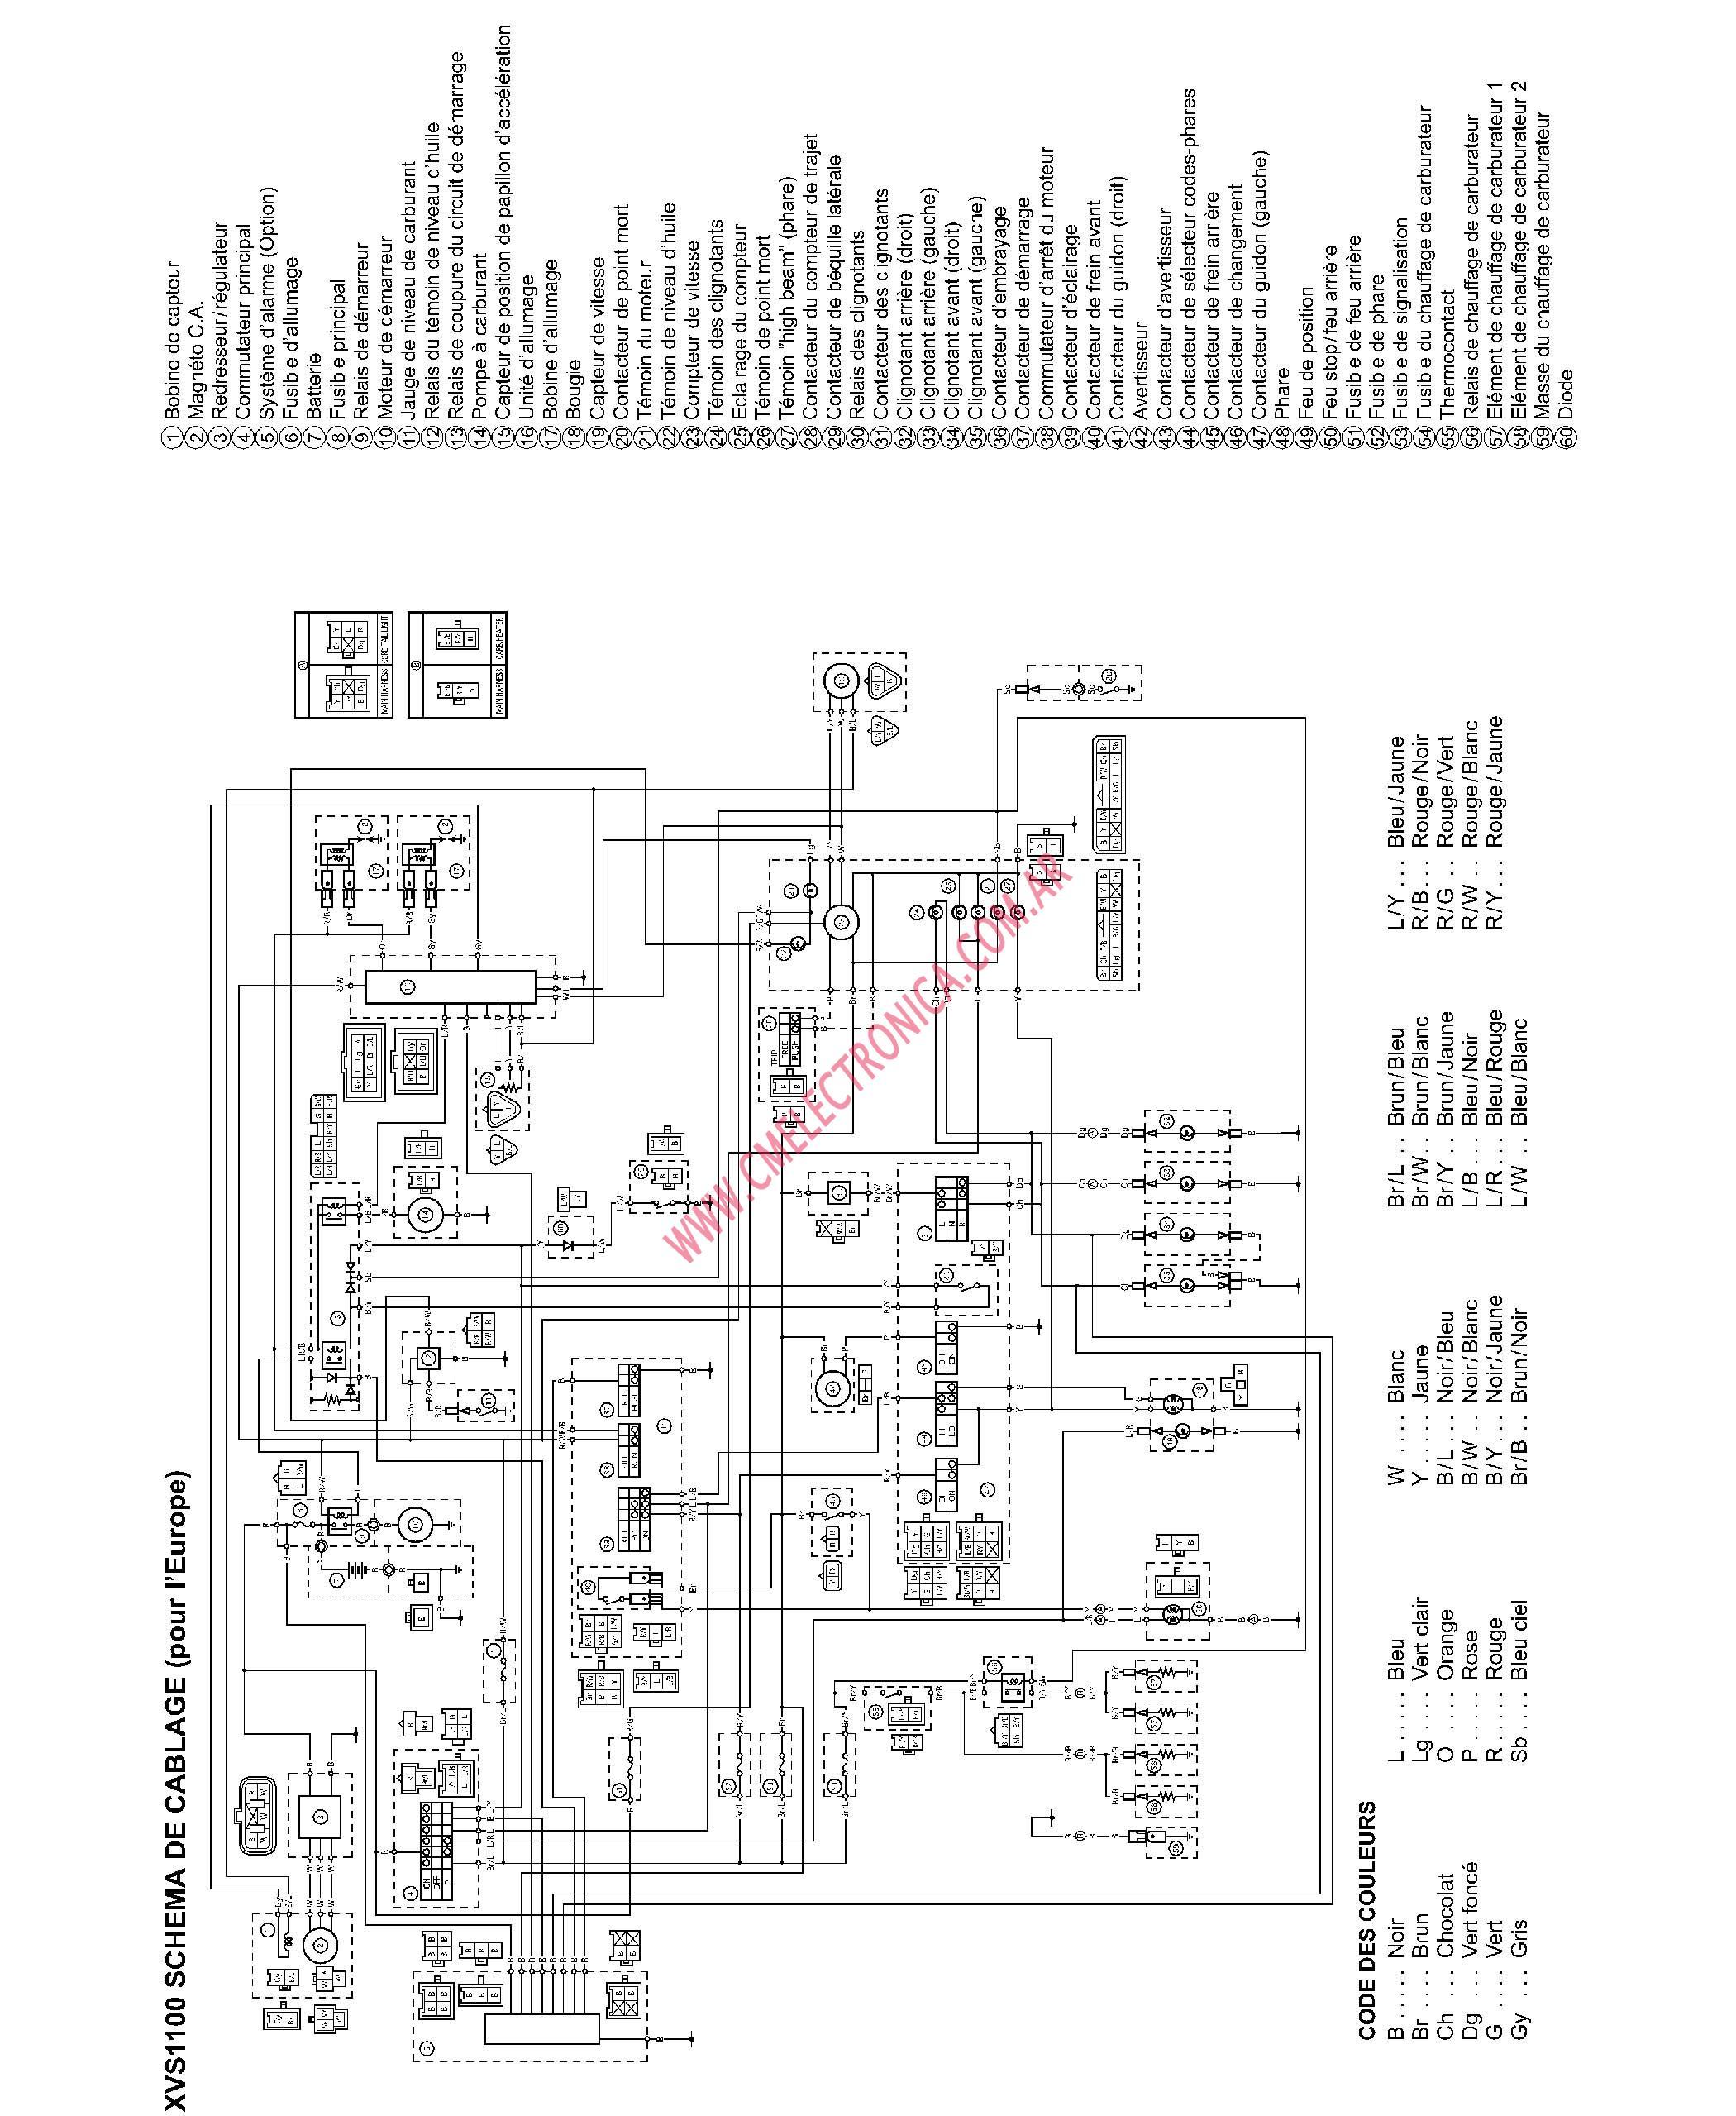 Radio Wiring Diagram 1994 Dodge Shadow Content Resource Of 2500 Factory Honda Goldwing Schematic Rh Aiandco Co 1996 Dakota Color